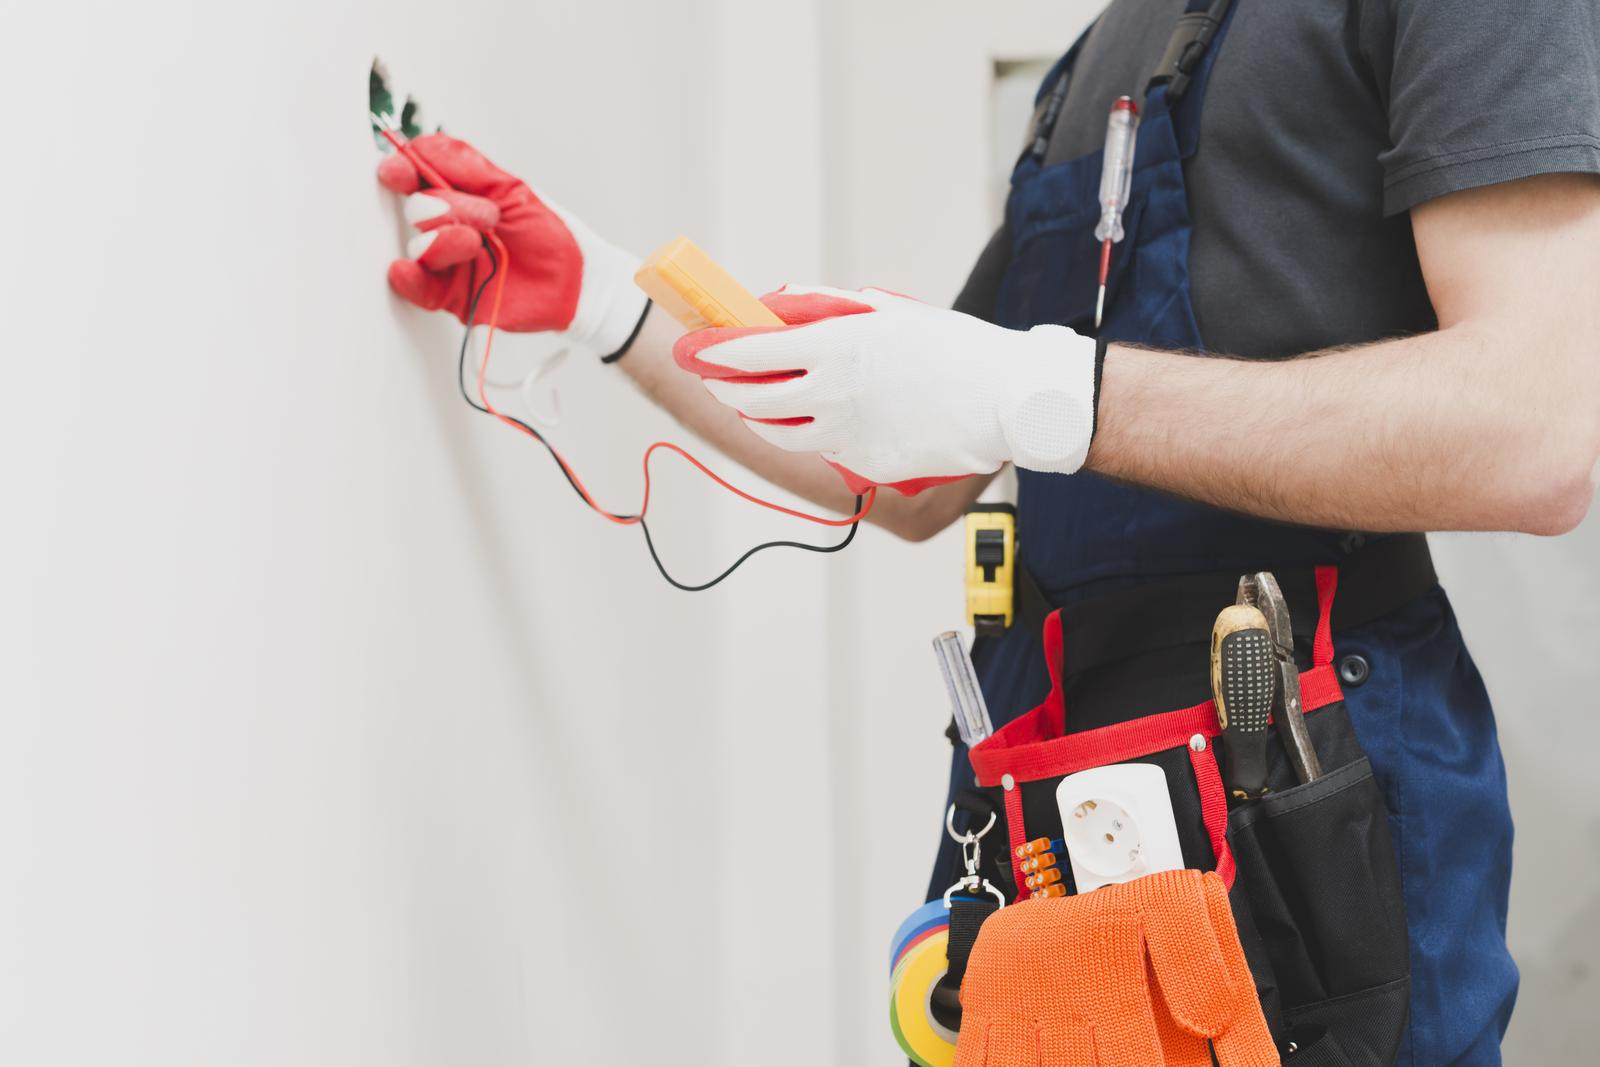 Electrical installation in Lääne county